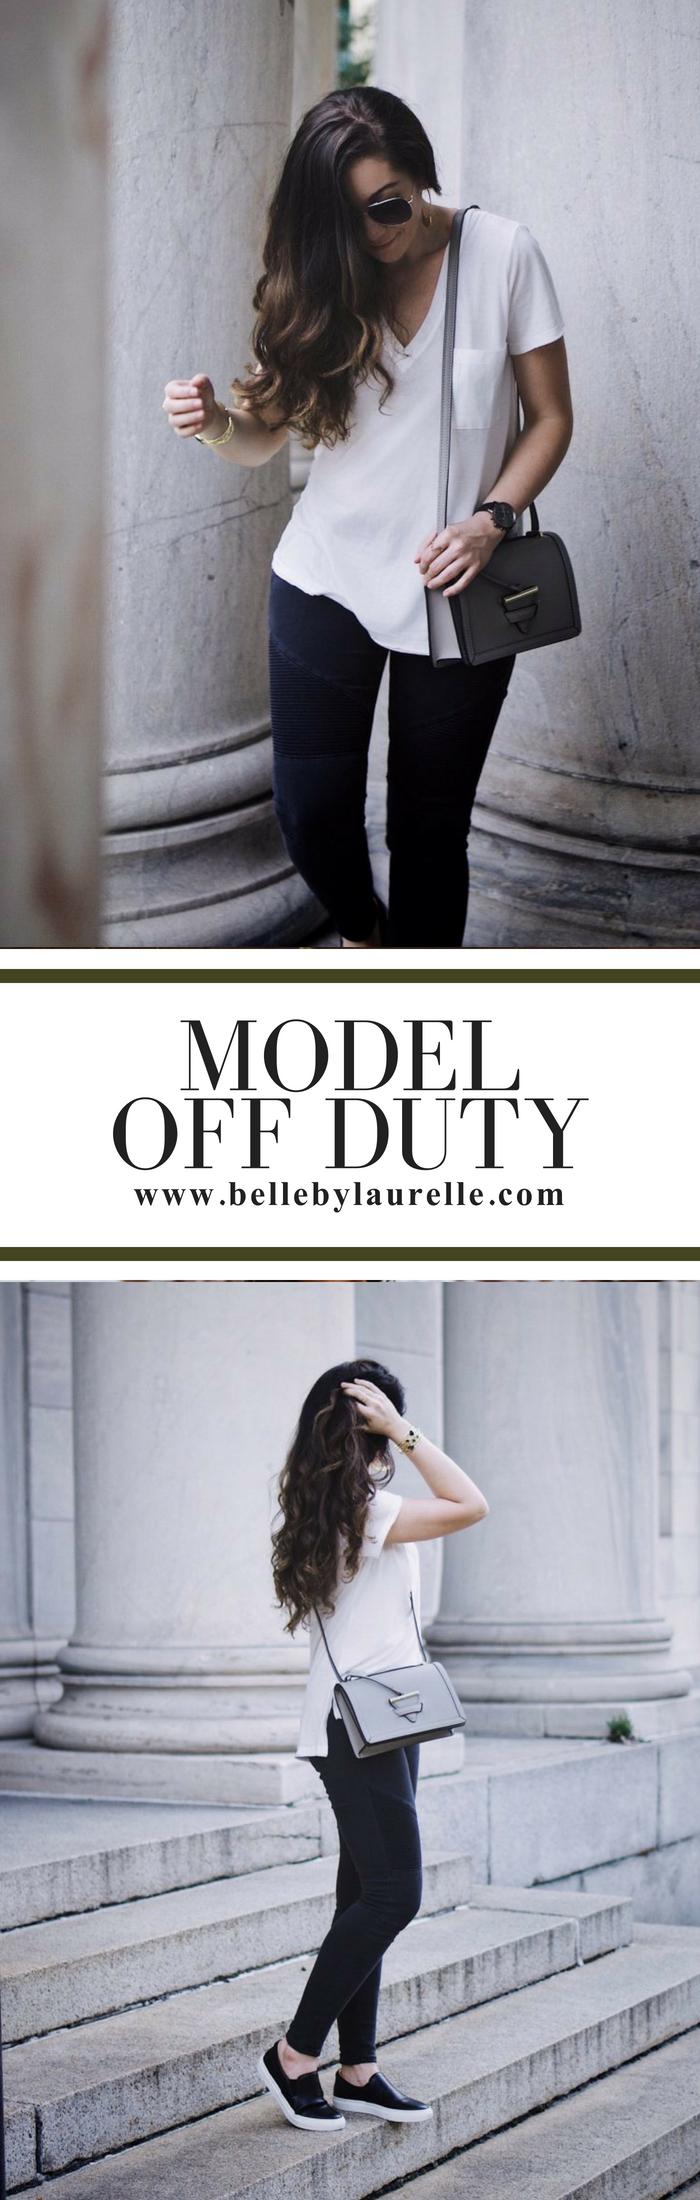 Belle by Laurelle Model Off Duty Fashion Blog